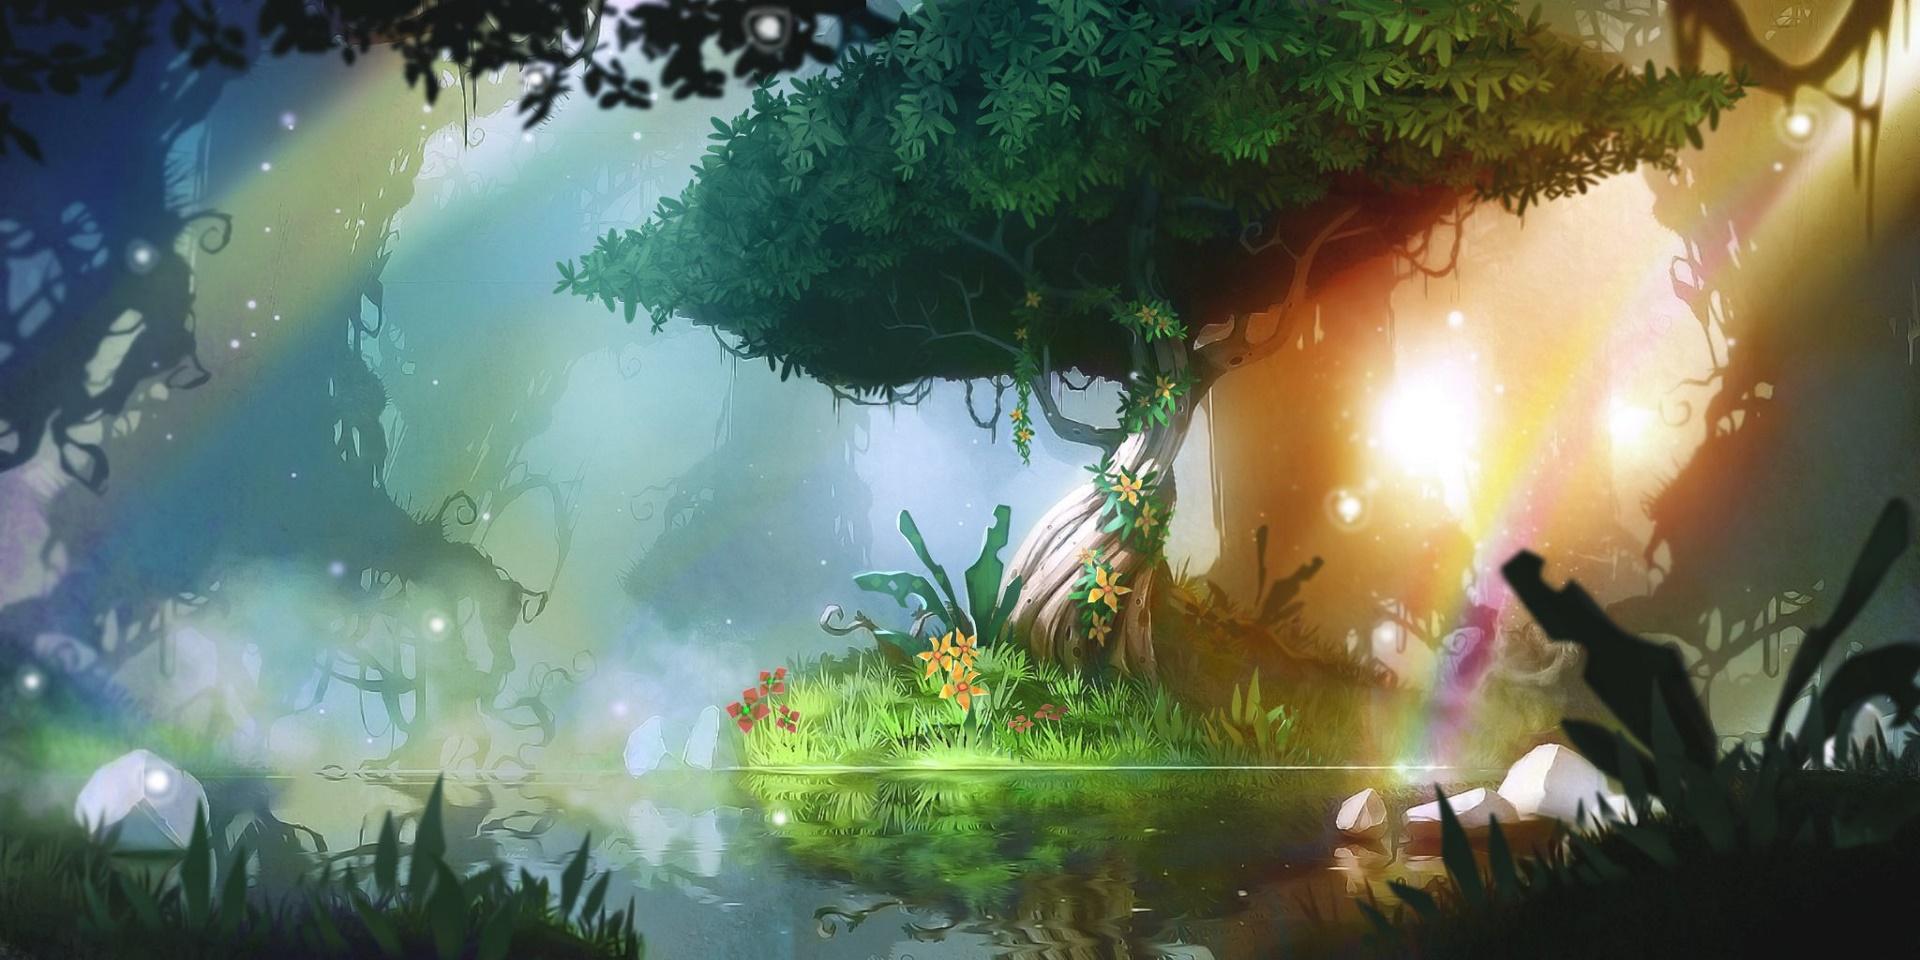 Nintendo 3d Wallpaper Fondos De Pantalla De Yooka Laylee Wallpapers